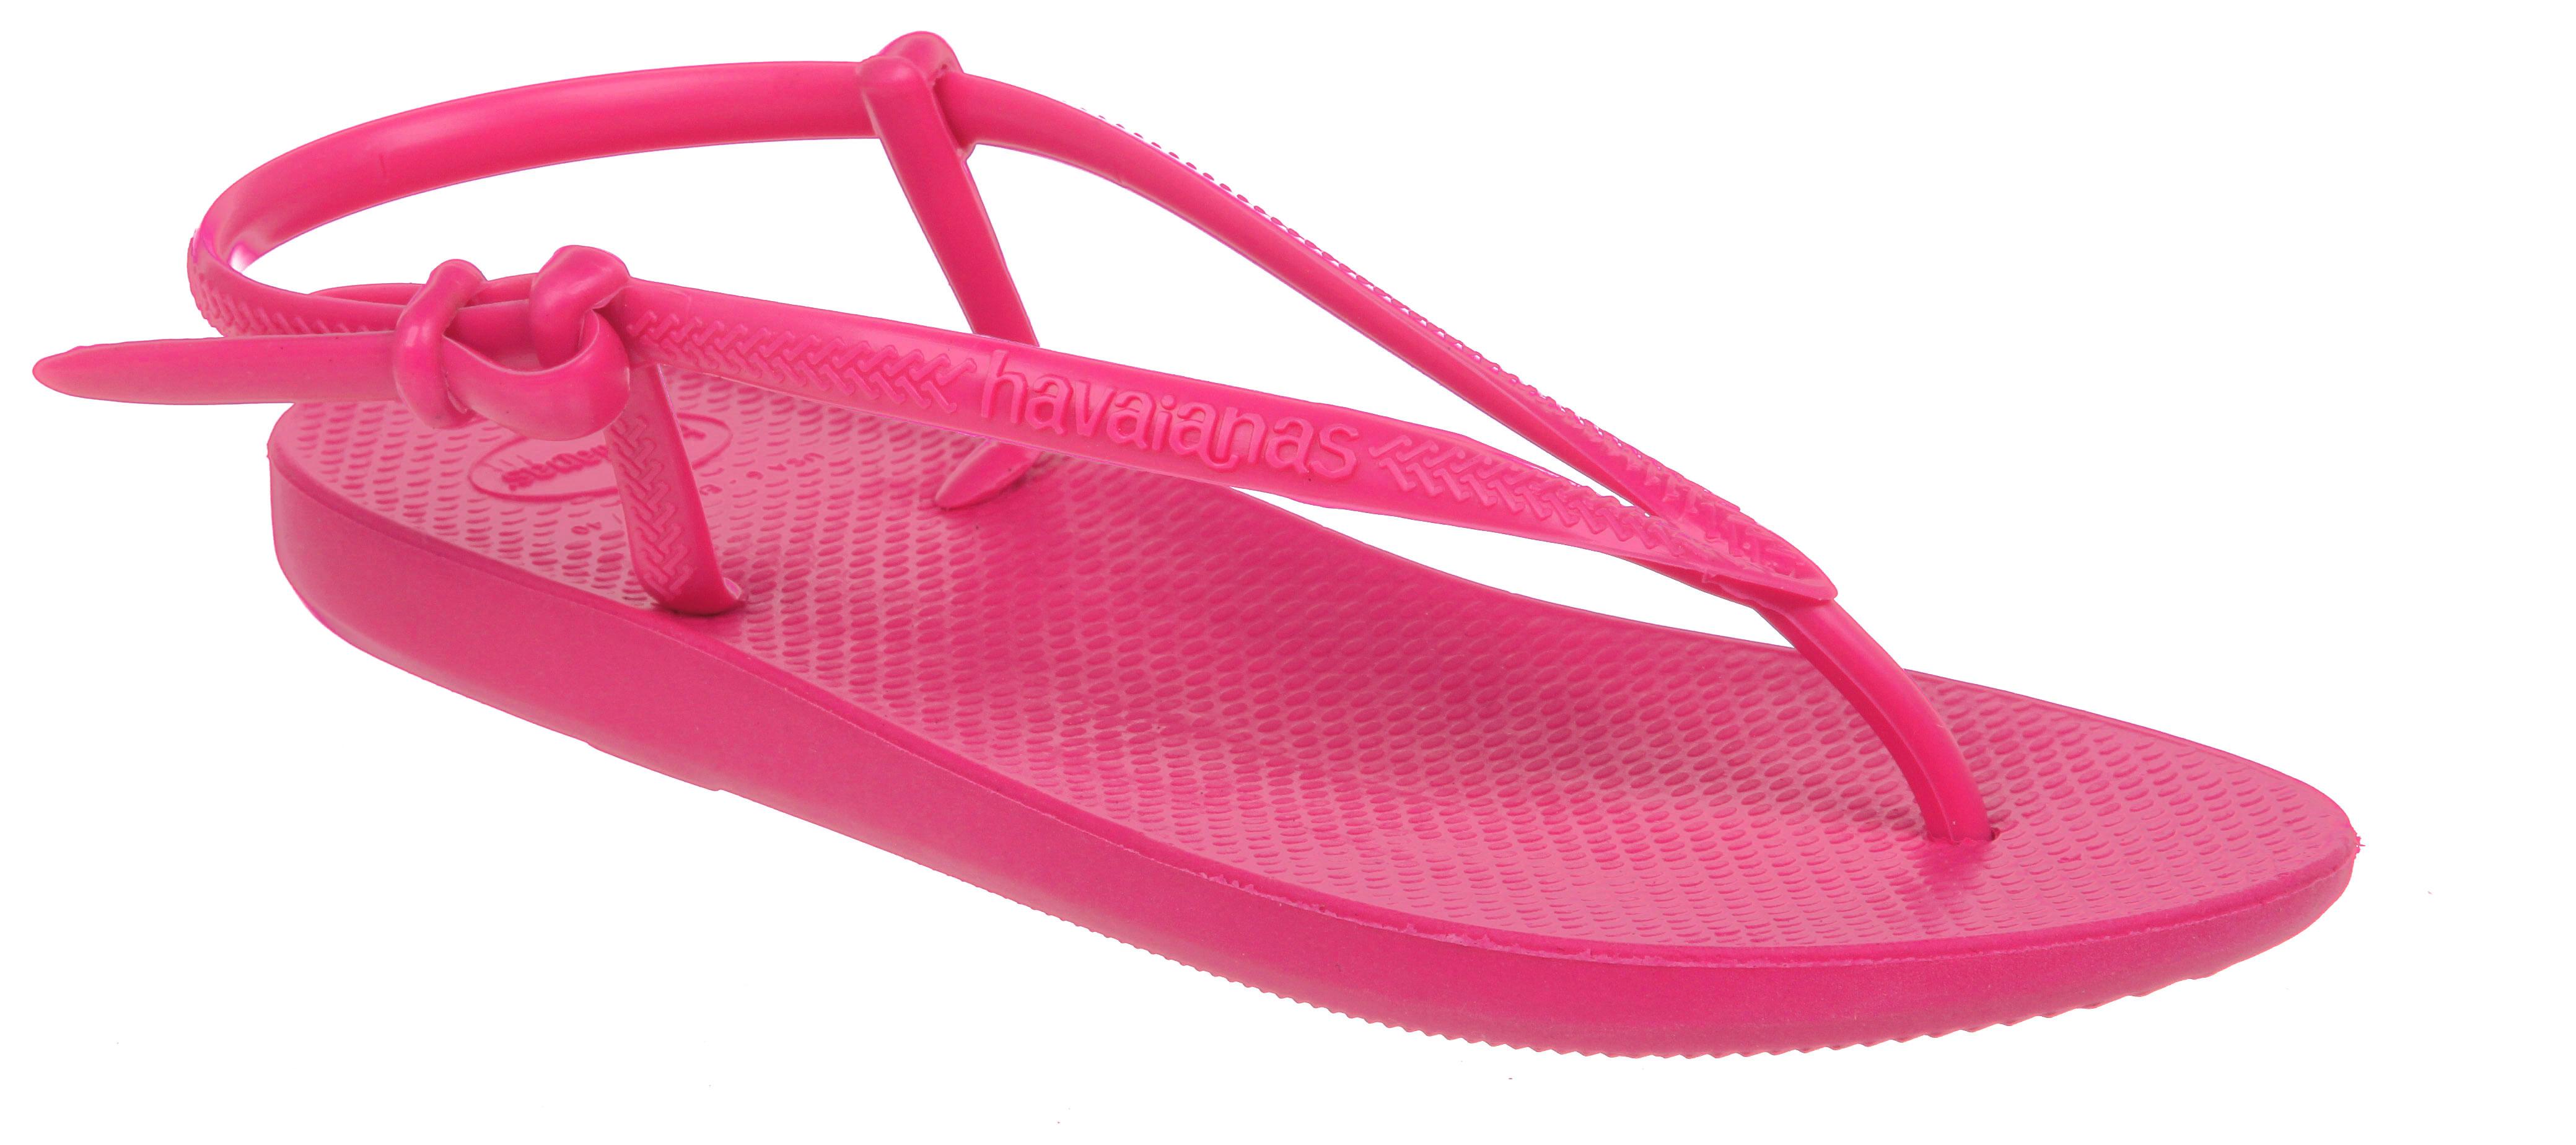 Womens Havaianas Fit Flip-flop Hot Pink Sandals